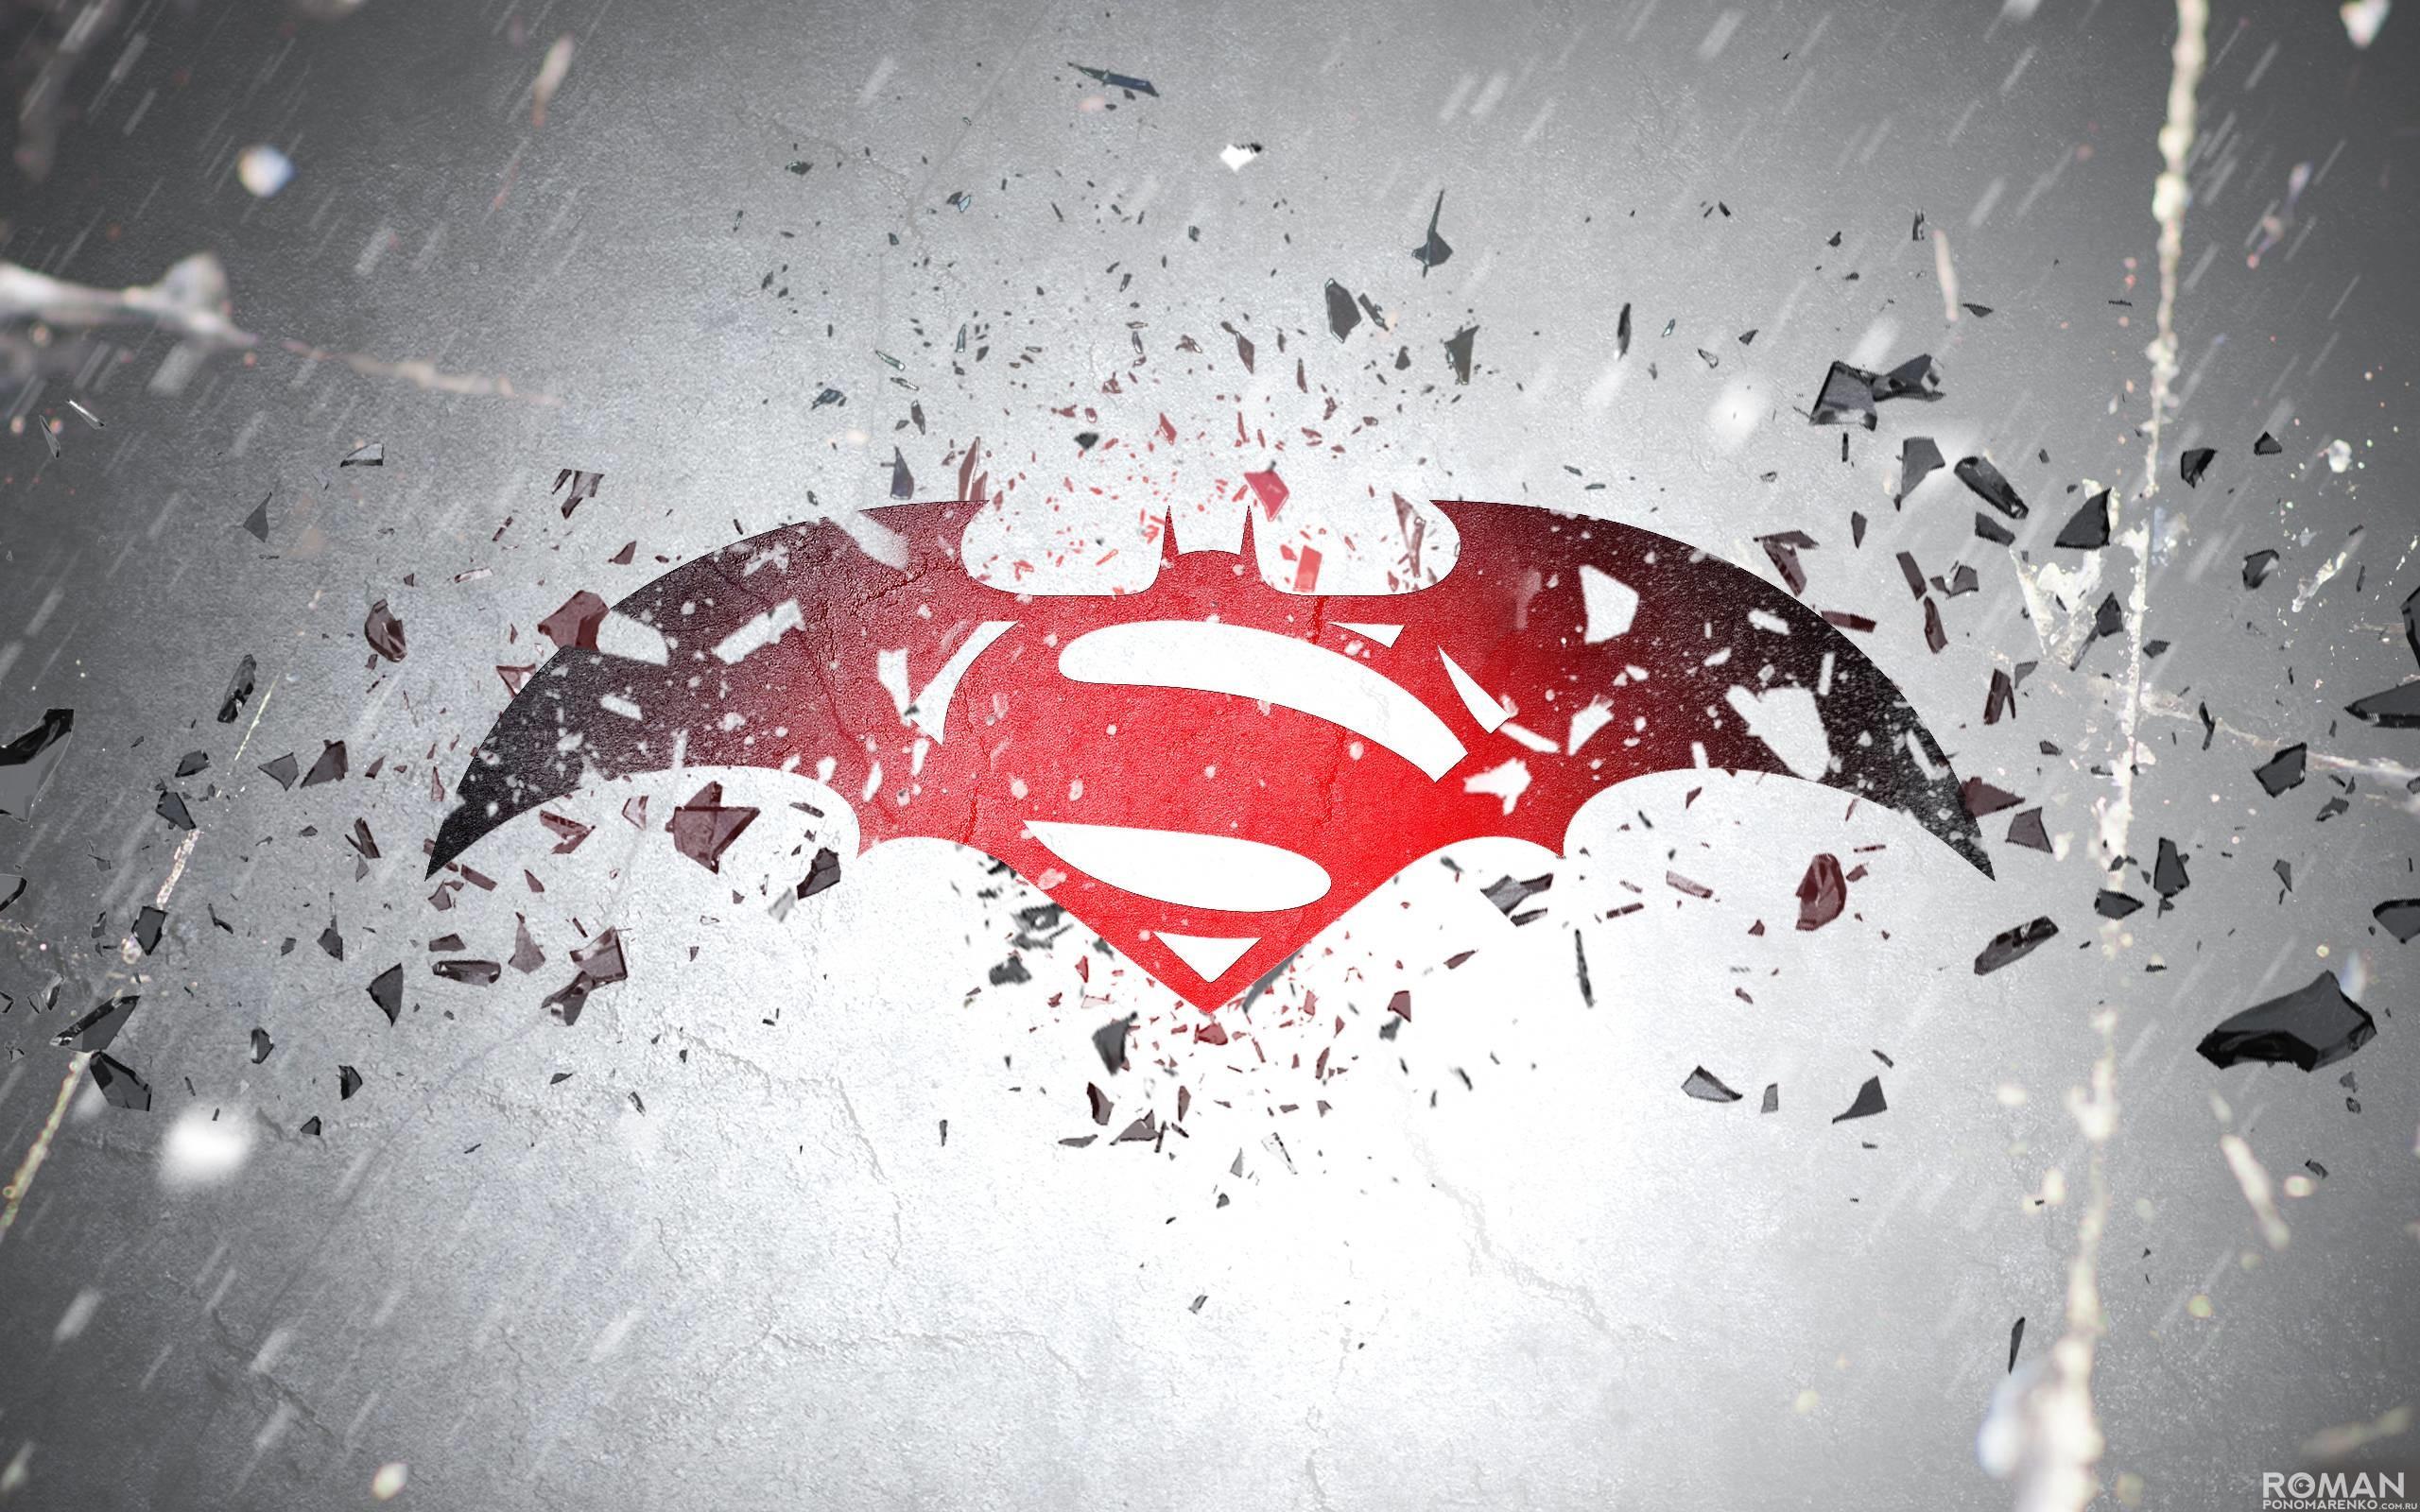 Batman Vs Superman Wallpaper Hd Posted By Ryan Johnson